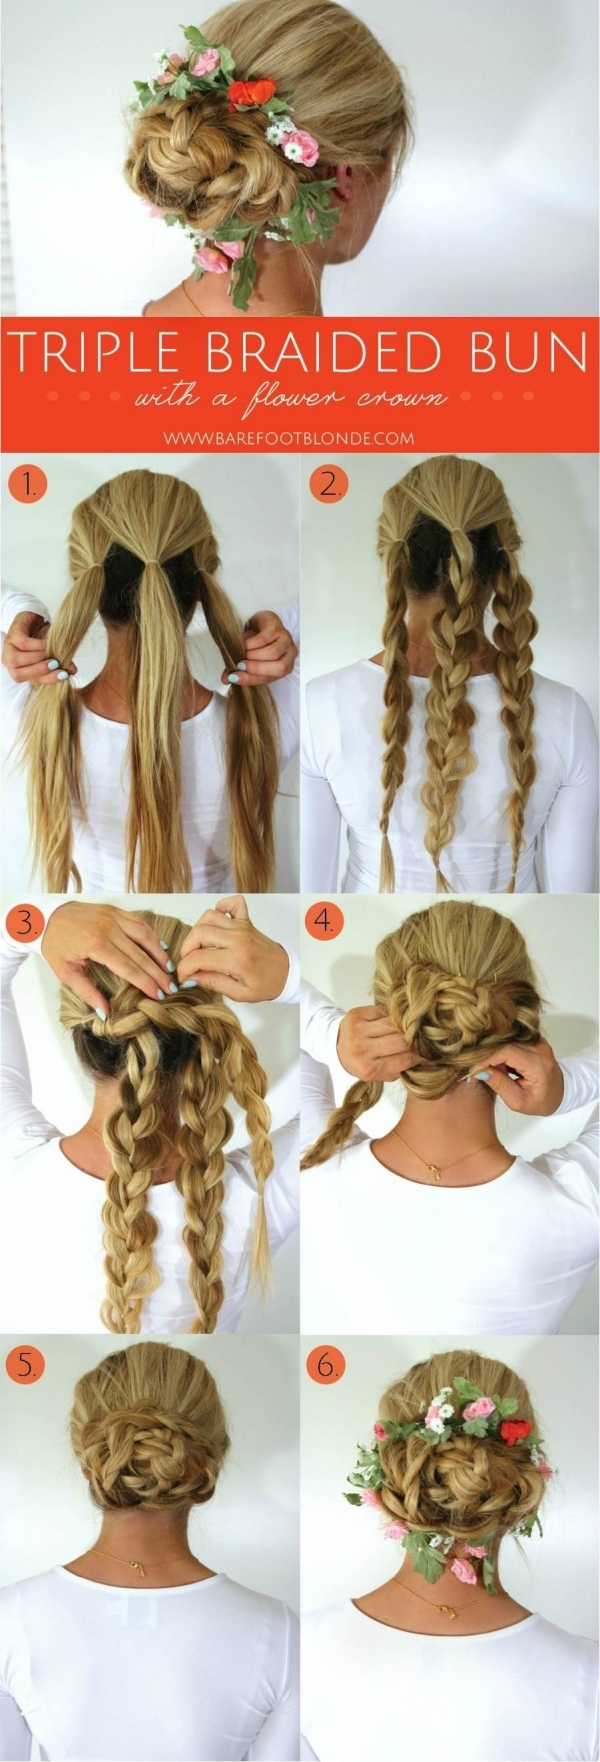 2 Triple Braided Bun 43 Fancy Braided Hairstyle Ideas From